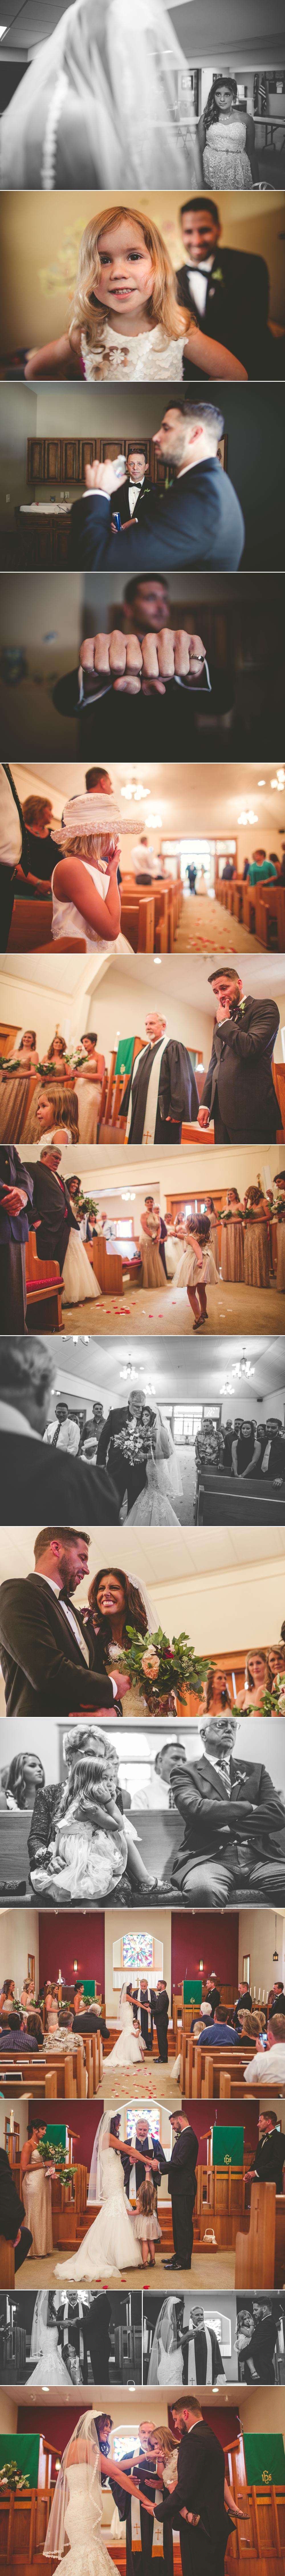 jason_domingues_photography_best_kansas_city_wedding_photographer_louisburg_ks_tomahawk_hills_2.jpg